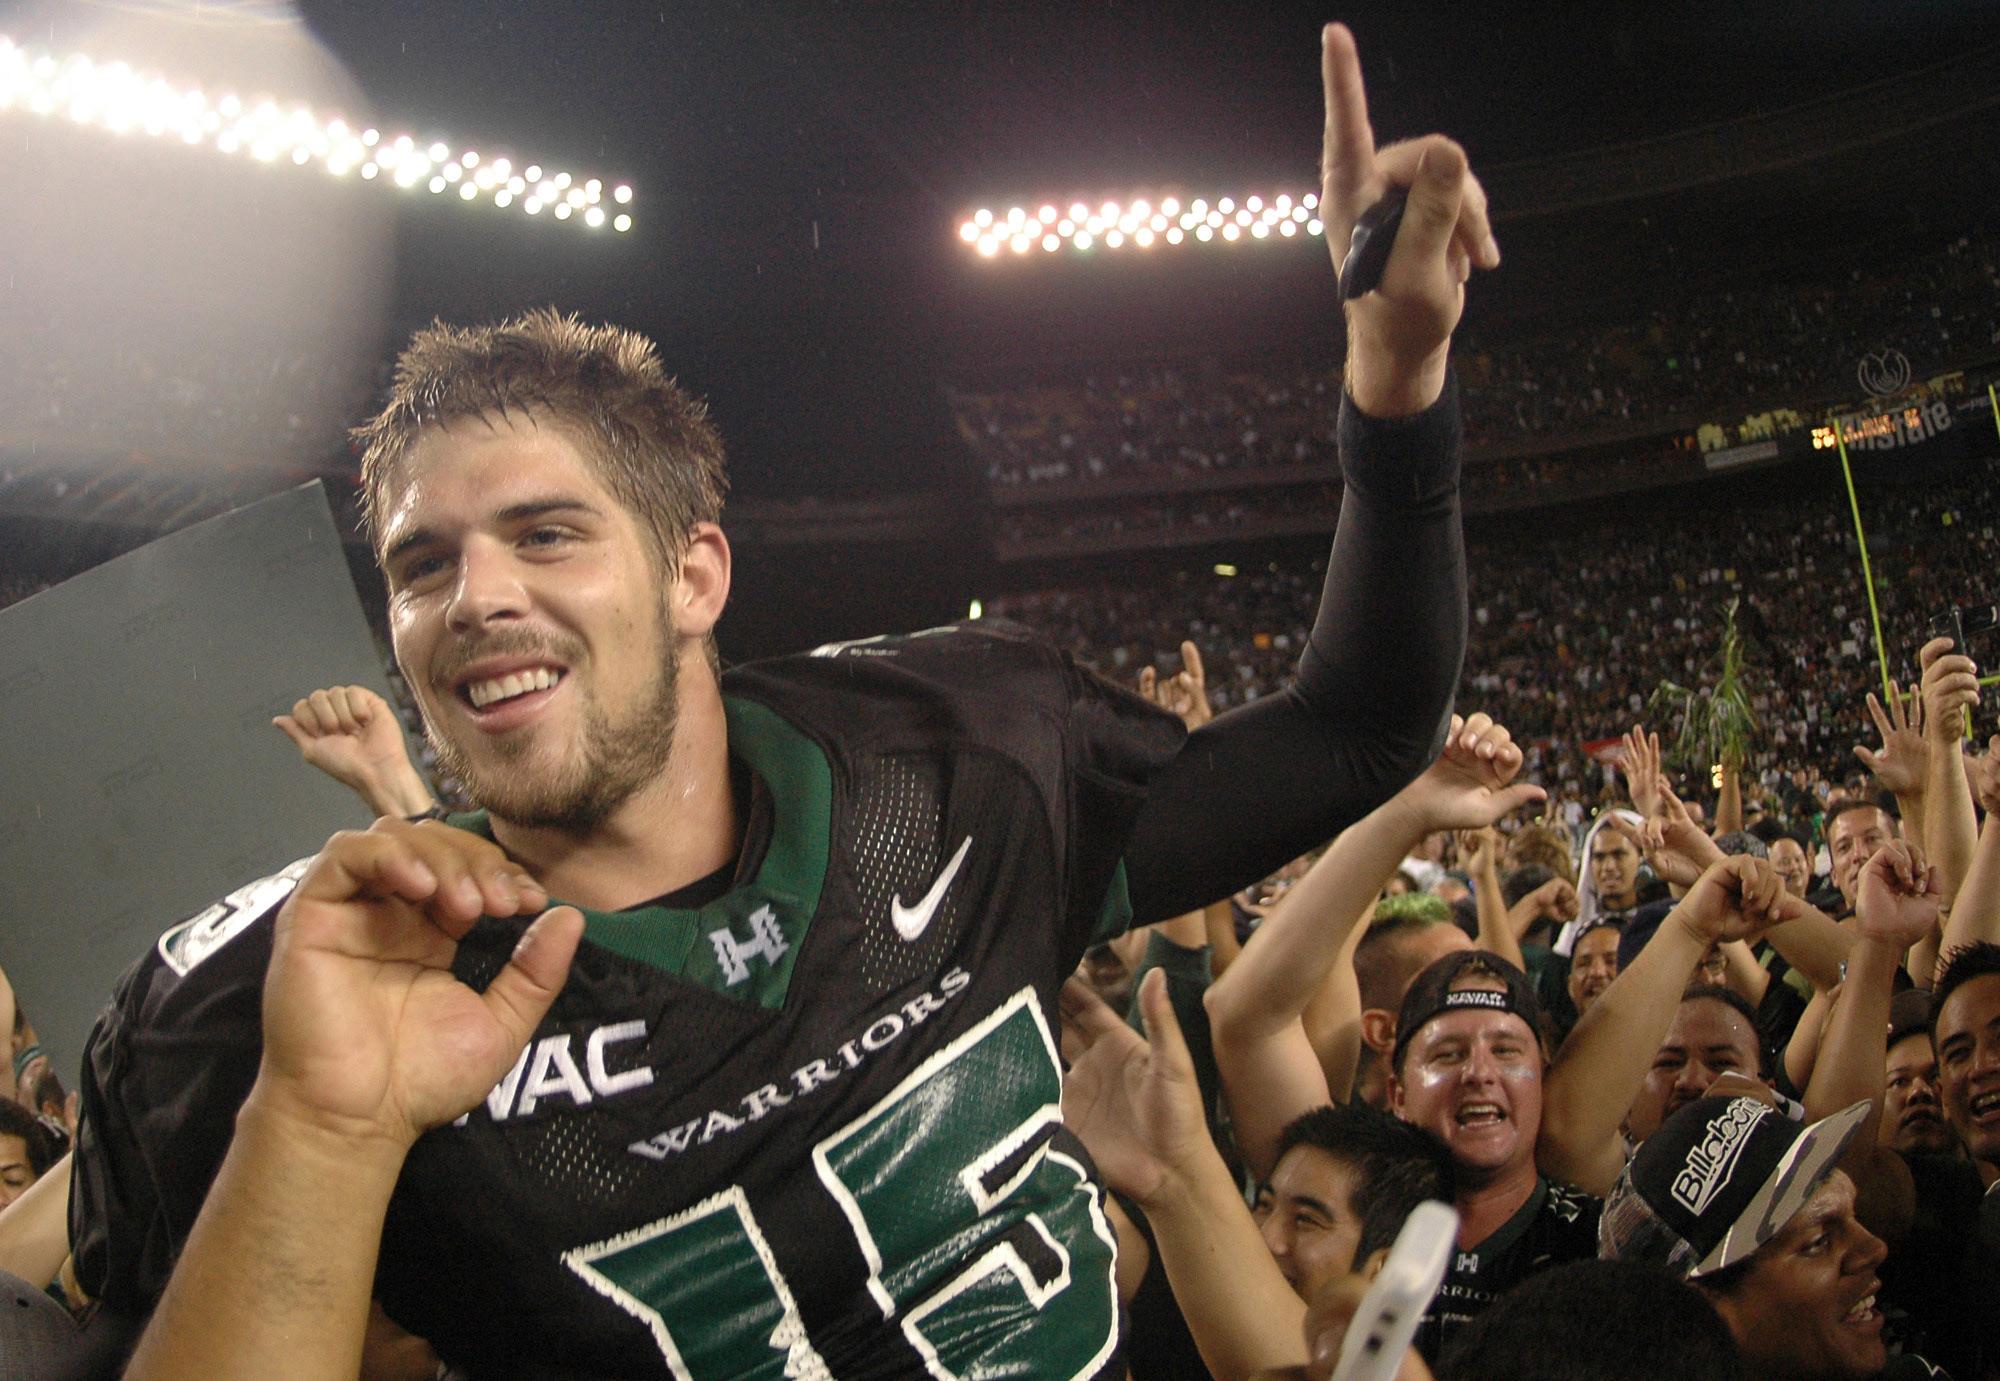 Colt Brennan, former star quarterback at the University of Hawaii, dies at 37